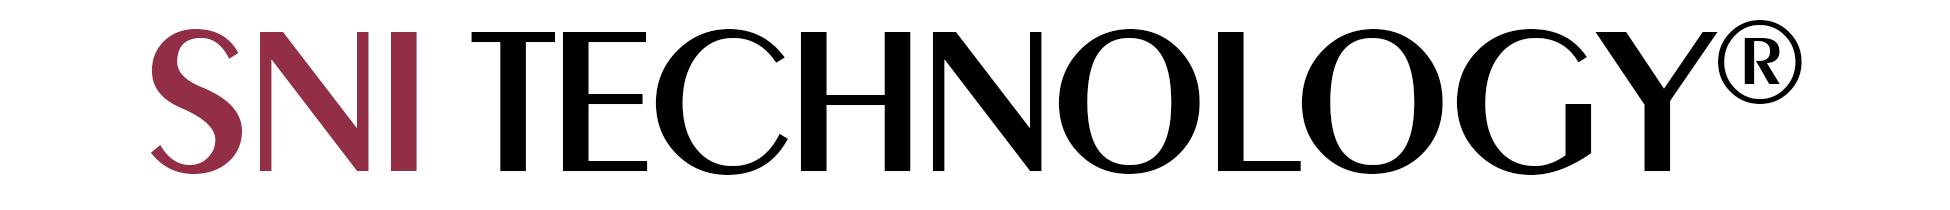 SNI Technology